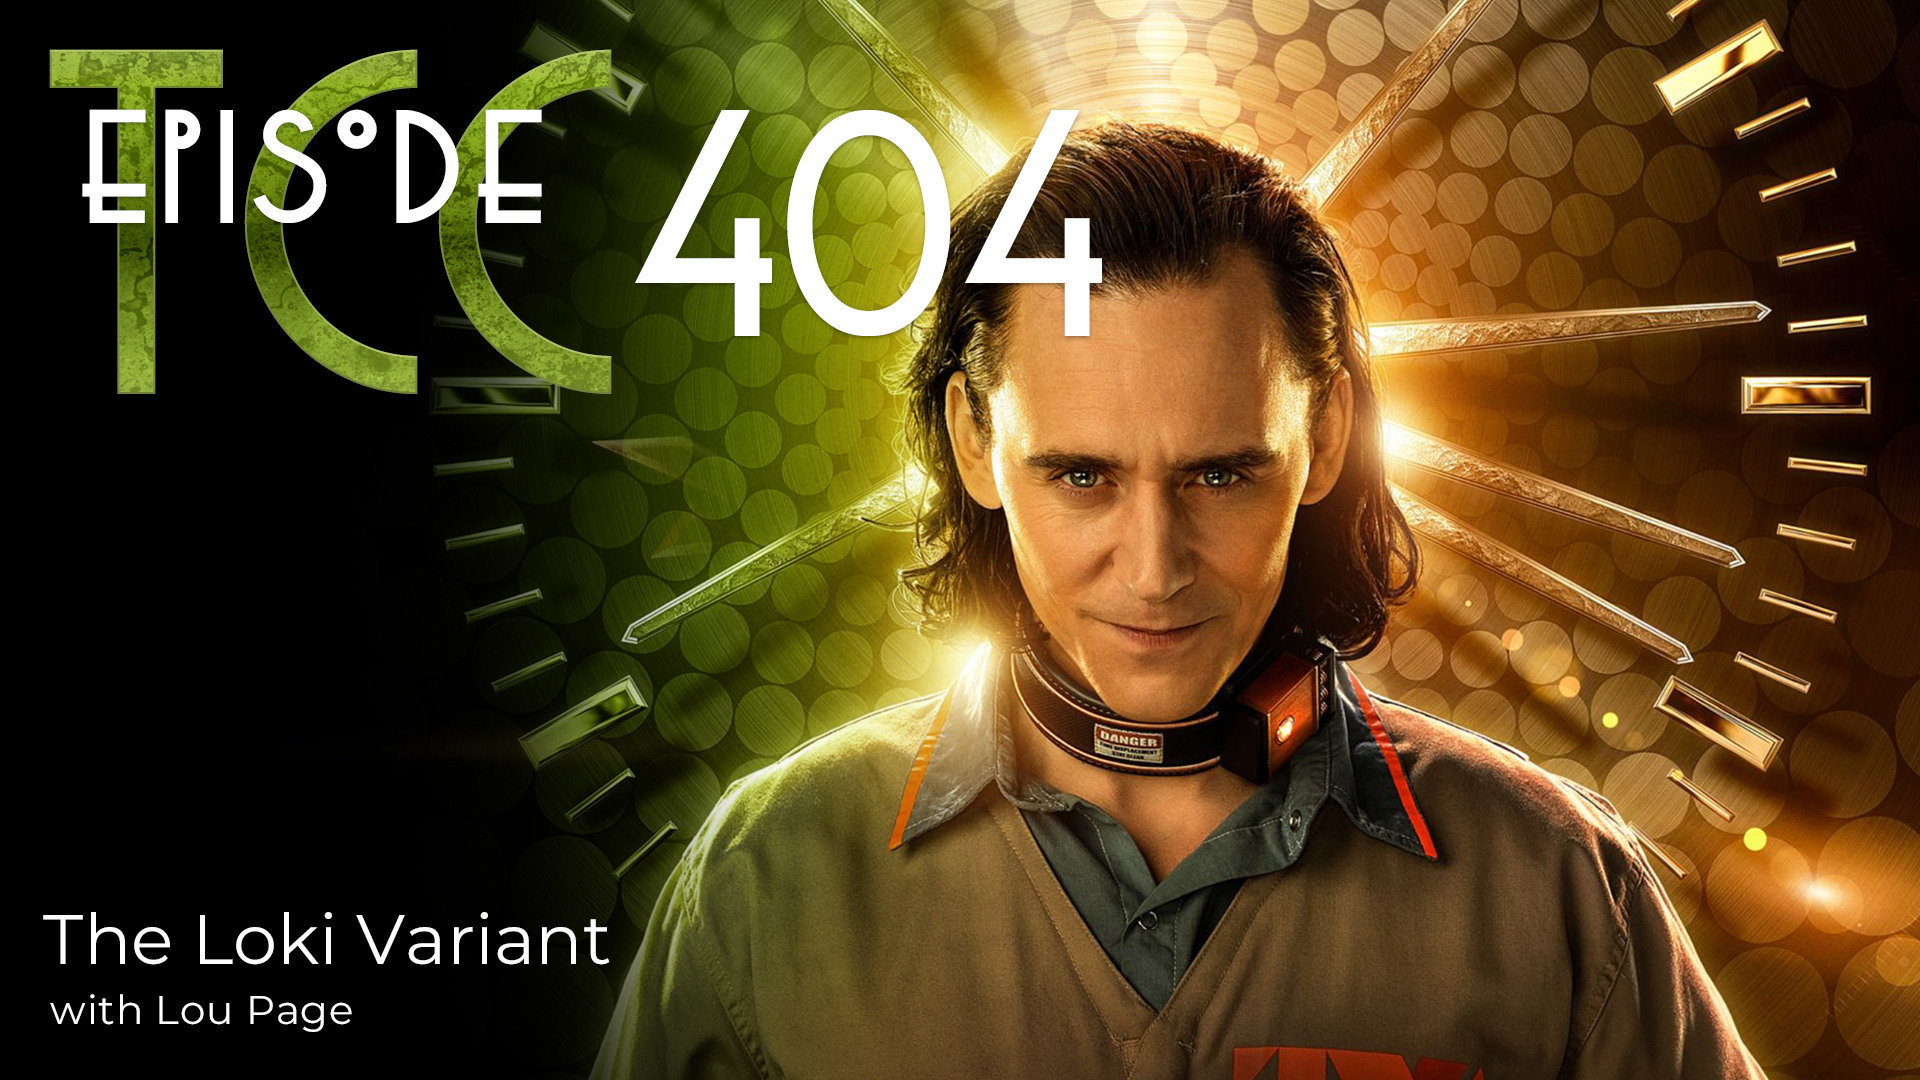 The Citadel Cafe 404: The Loki Variant